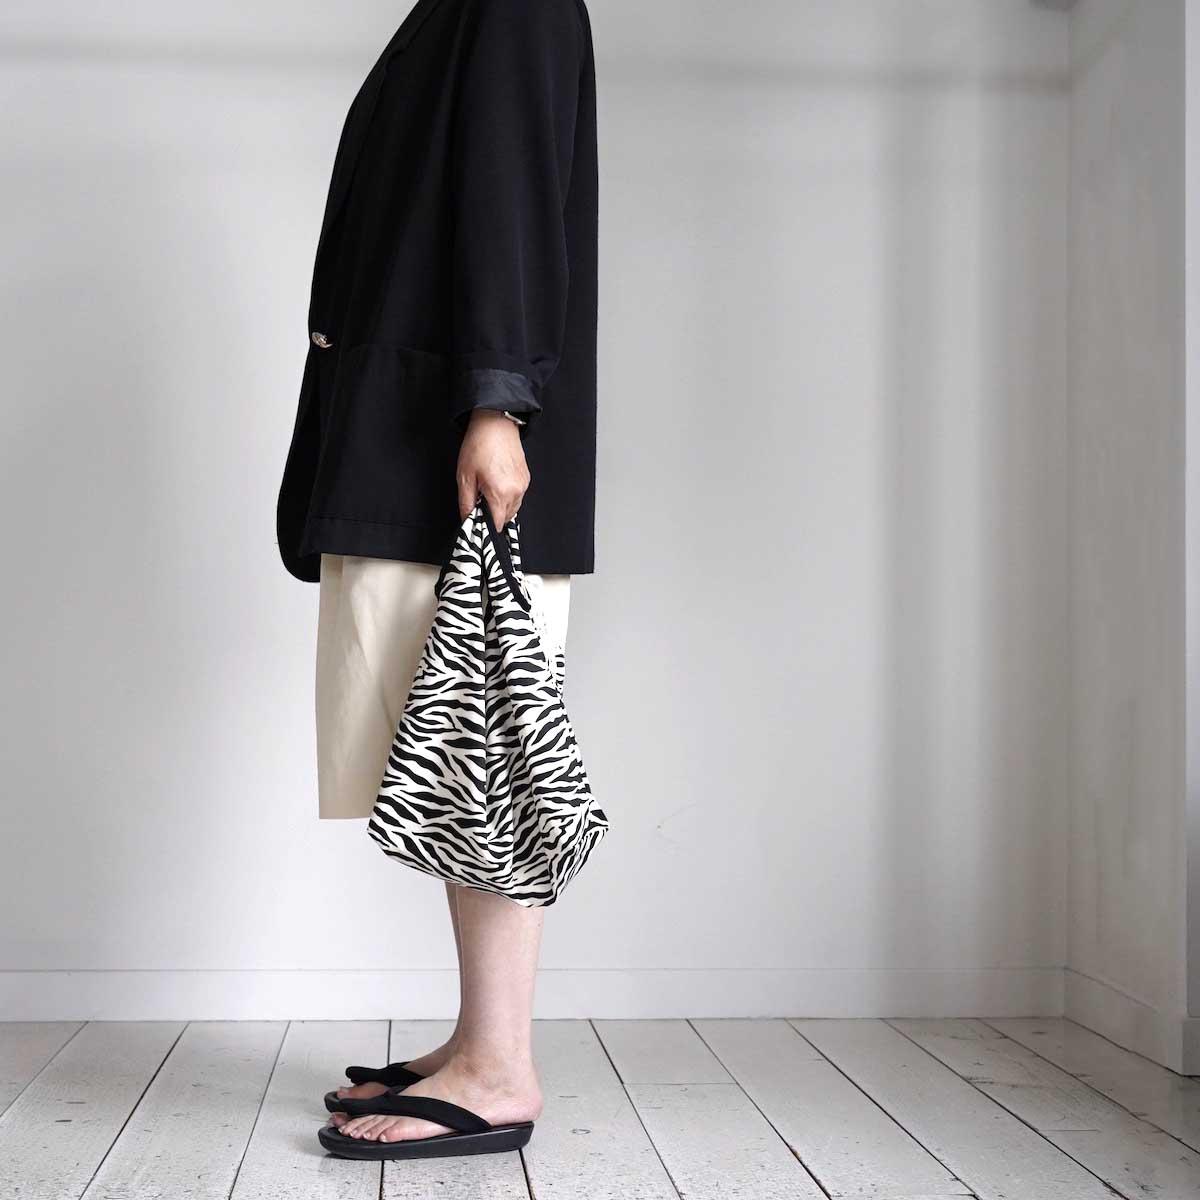 MASTER & Co. / ECO BAG SMALL (Zebra) 着用画像②